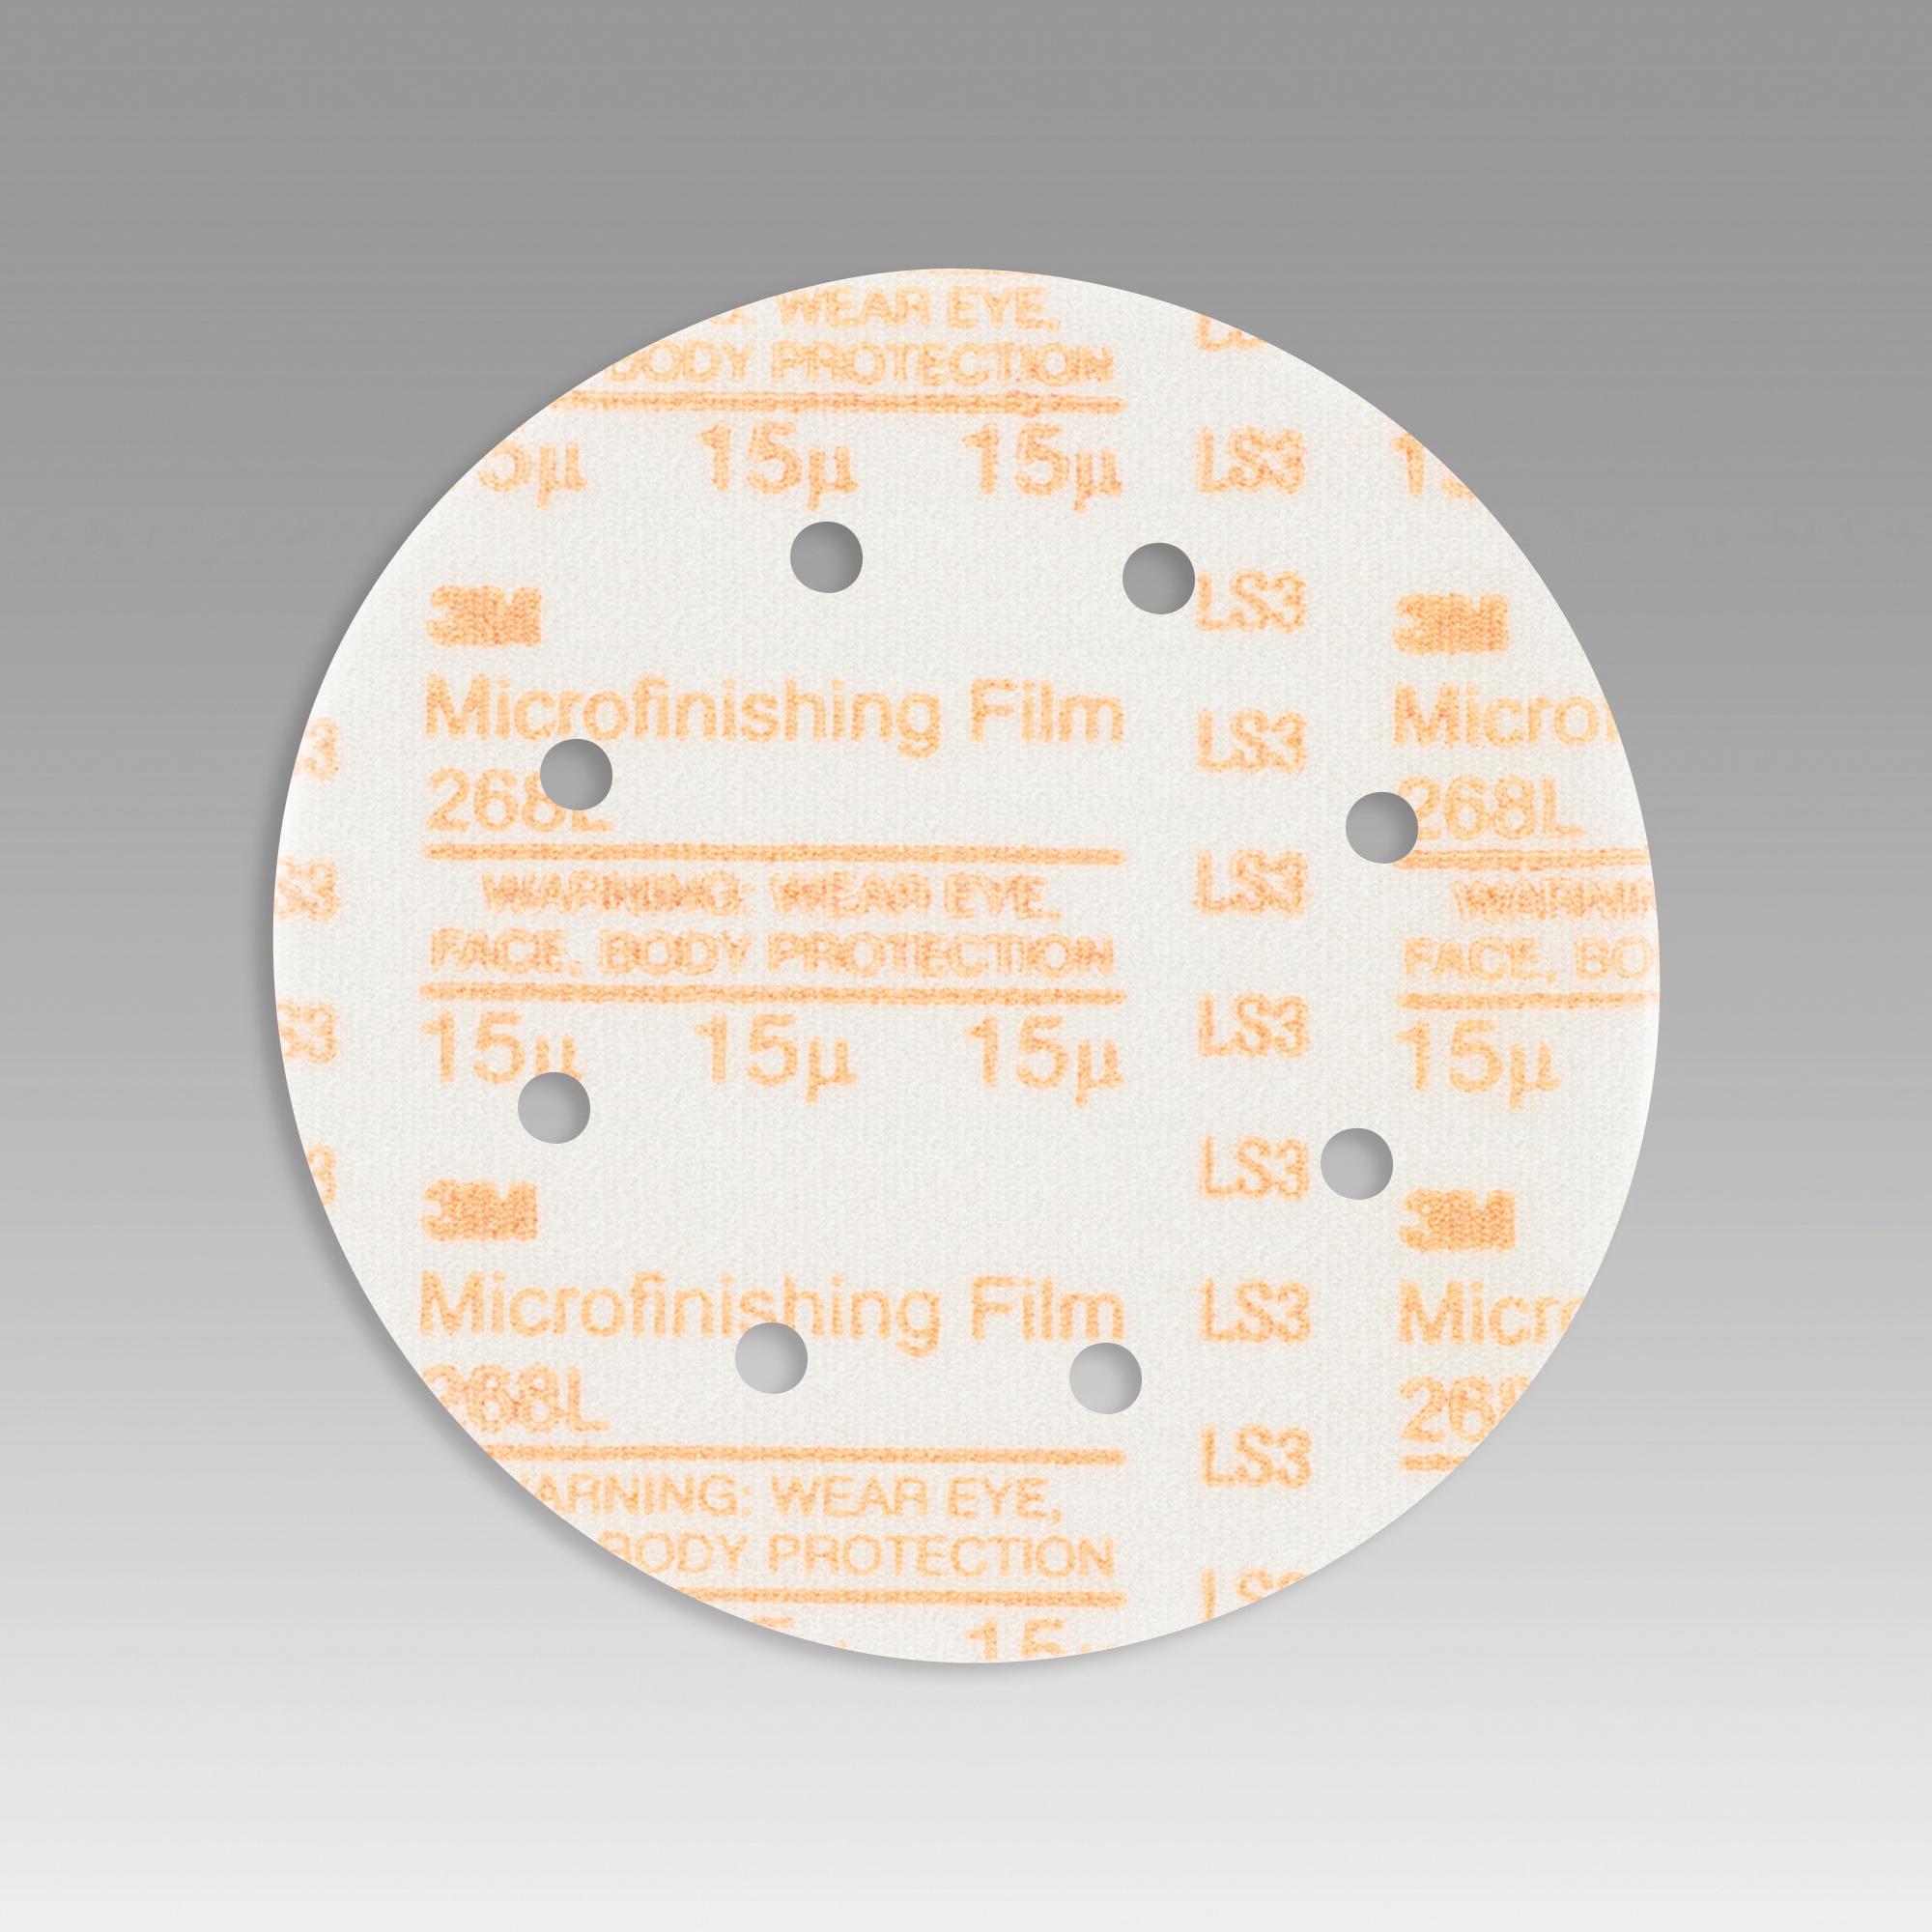 3M™ Hookit™ 051111-54552 268L Type D Microfinishing Orbital Sanding Disc, 6 in Dia Disc, 15 micron Grit, Super Fine Grade, Aluminum Oxide Abrasive, Polyester Film Backing